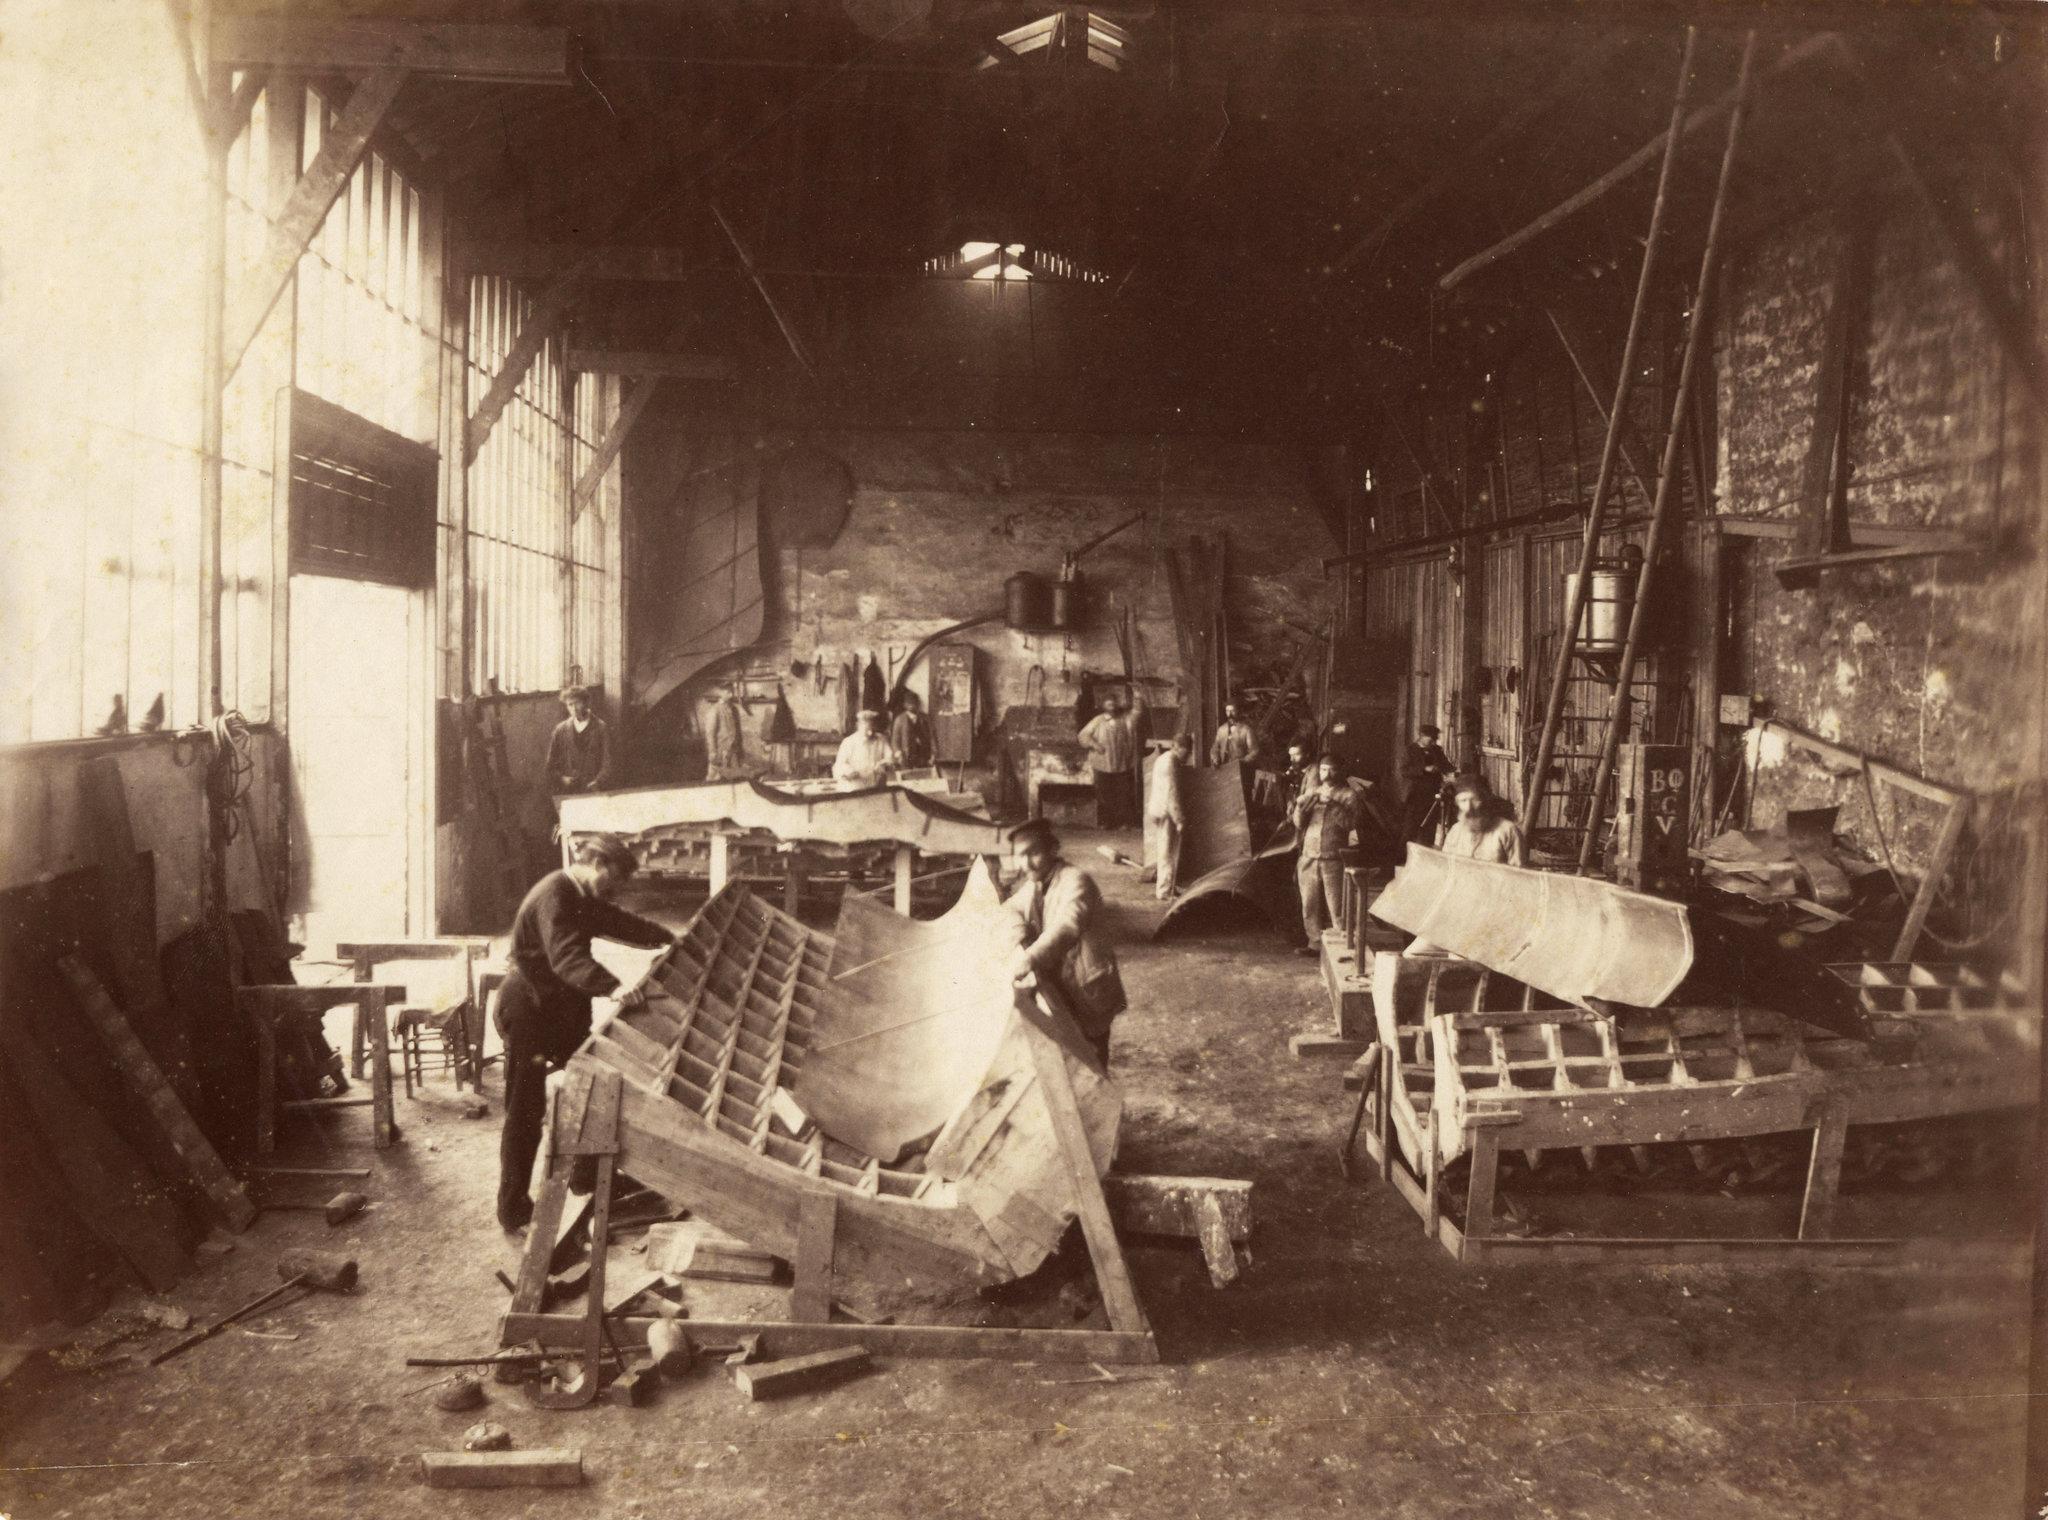 Construction of the Statue of Liberty, Paris Workshop of Gaget, Gauthier et Cie, ca.1878